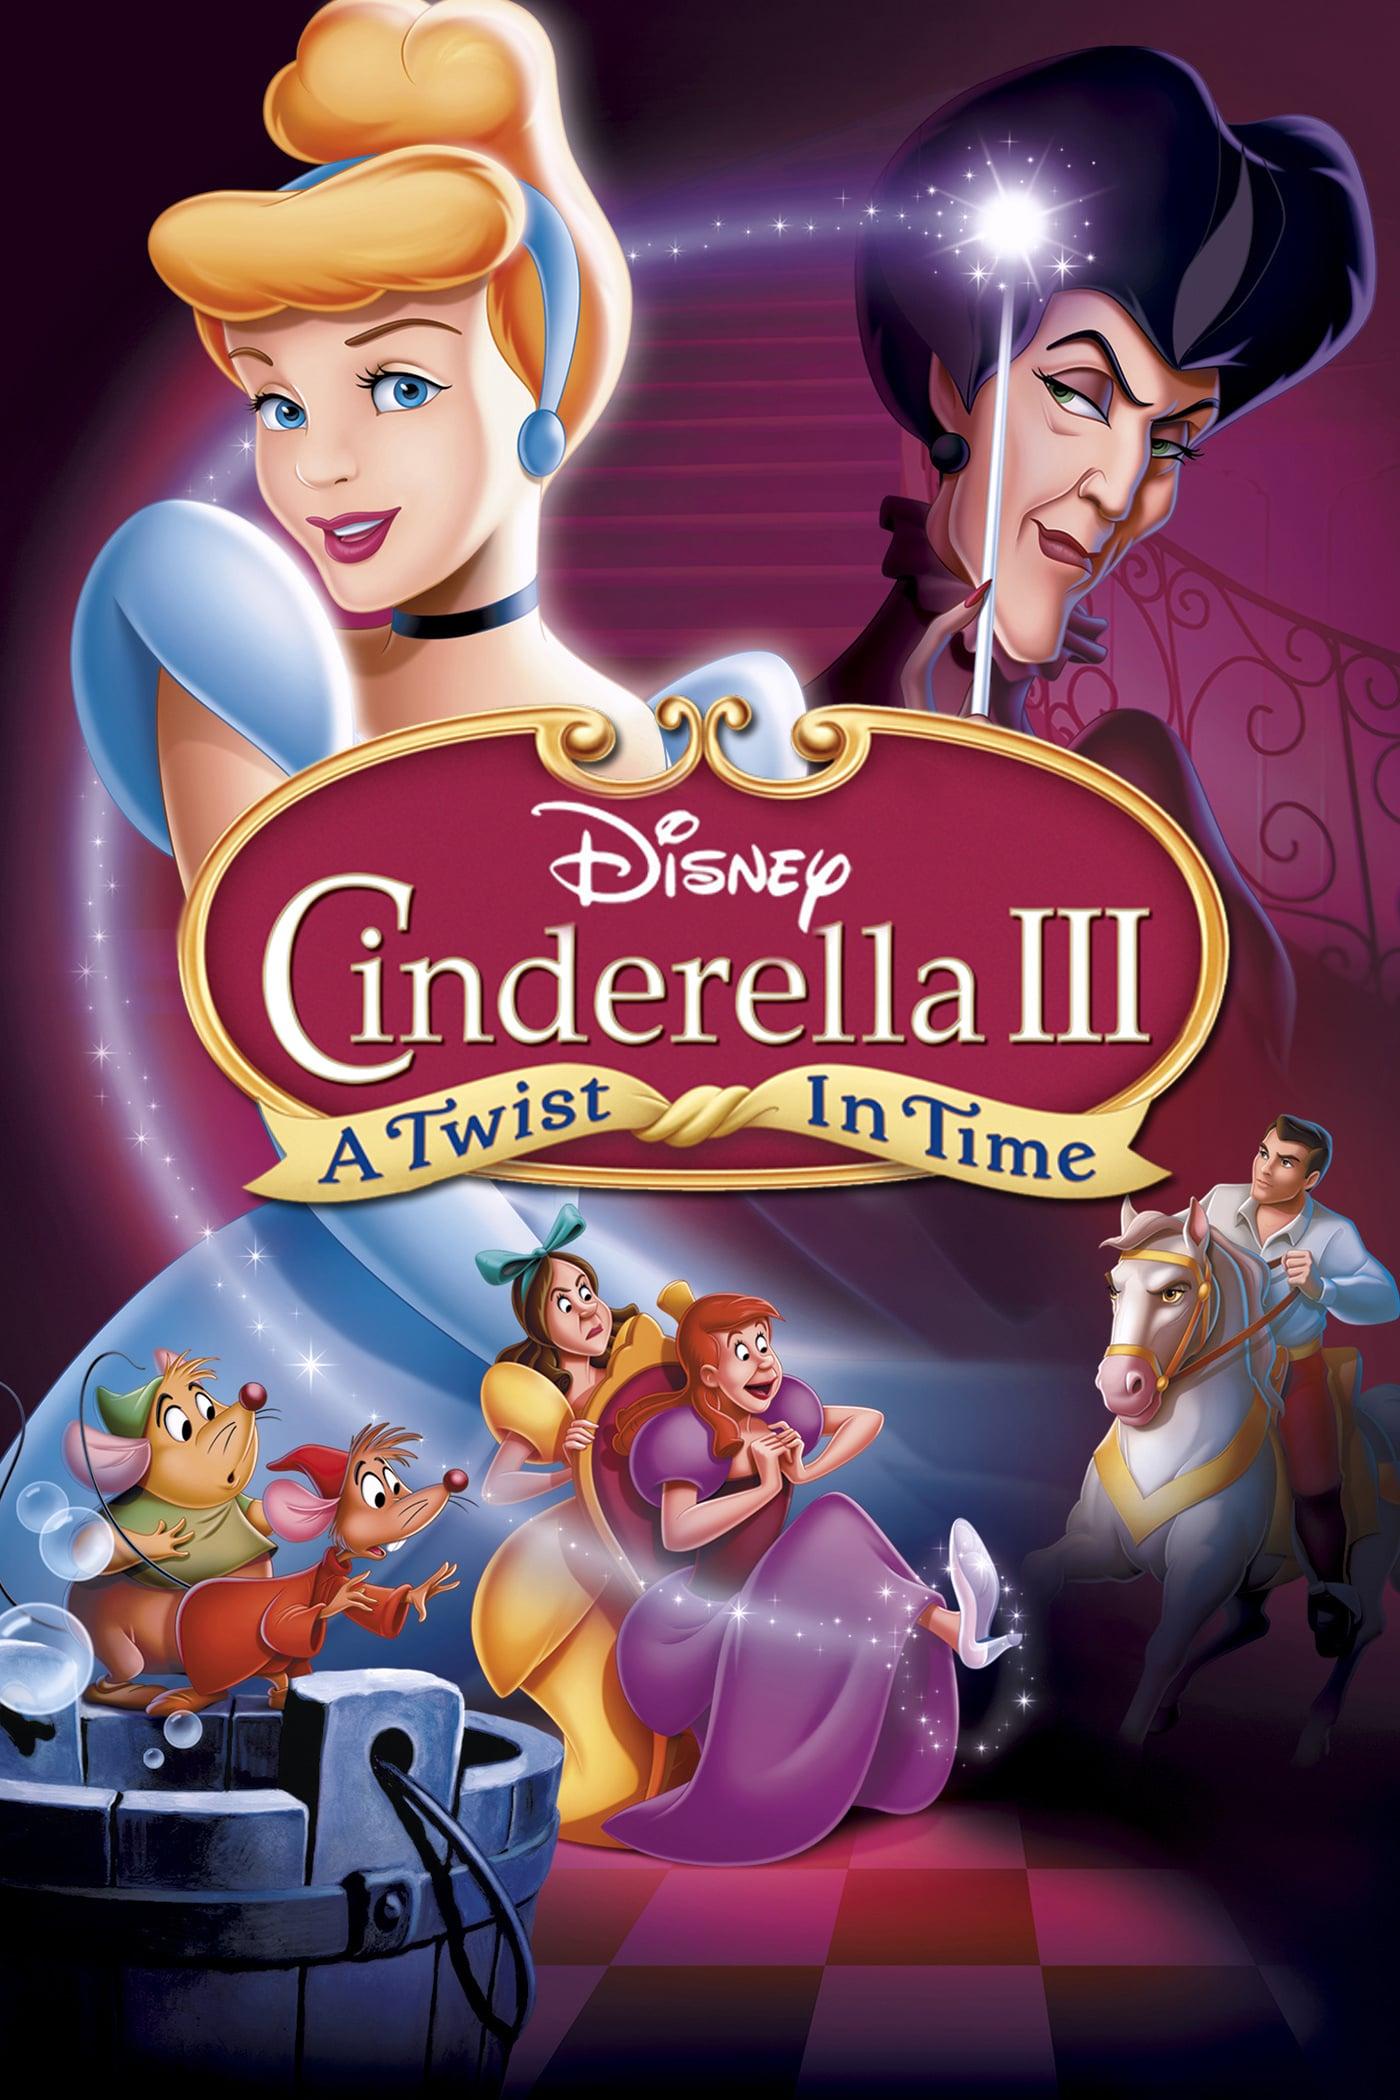 Cendrillon 3 : Le Sortilège De Cendrillon (2007) • Fr.film avec Cendrillon 3 Disney